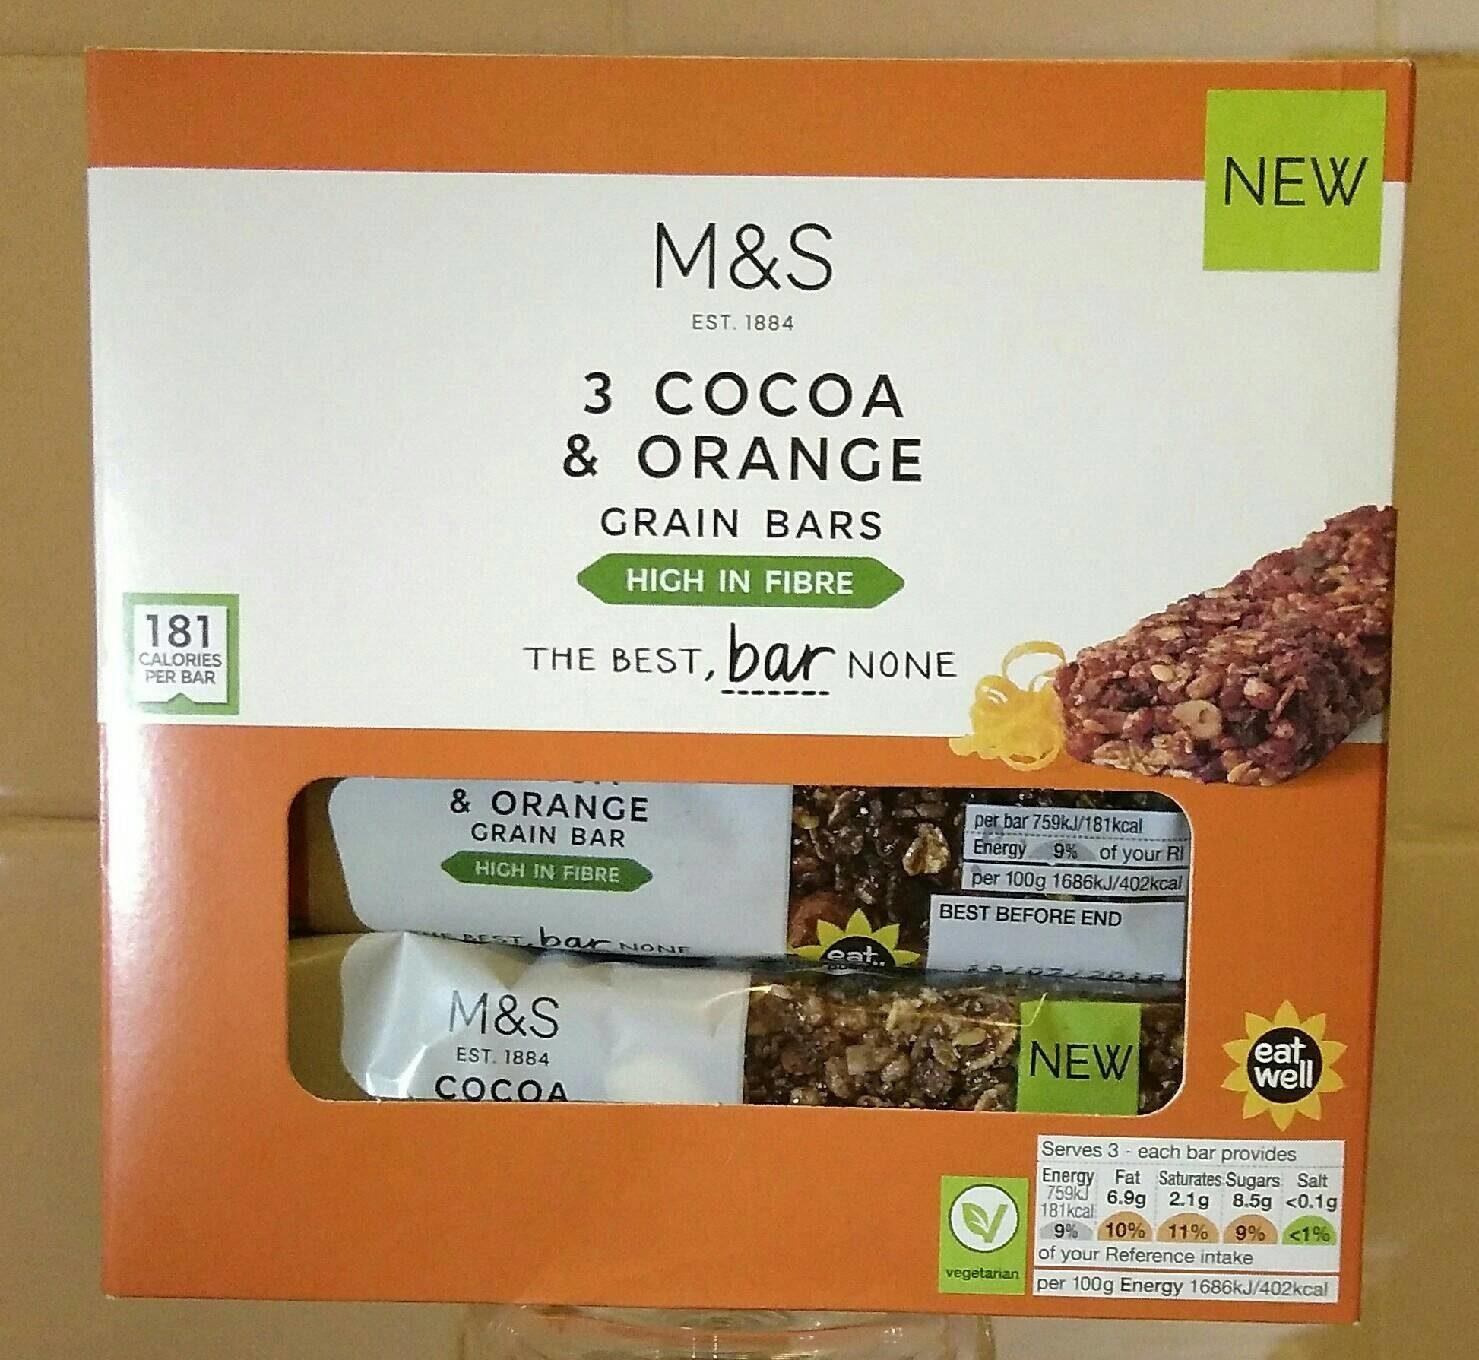 3 Cocoa & Orange Grain Bars - Product - fr